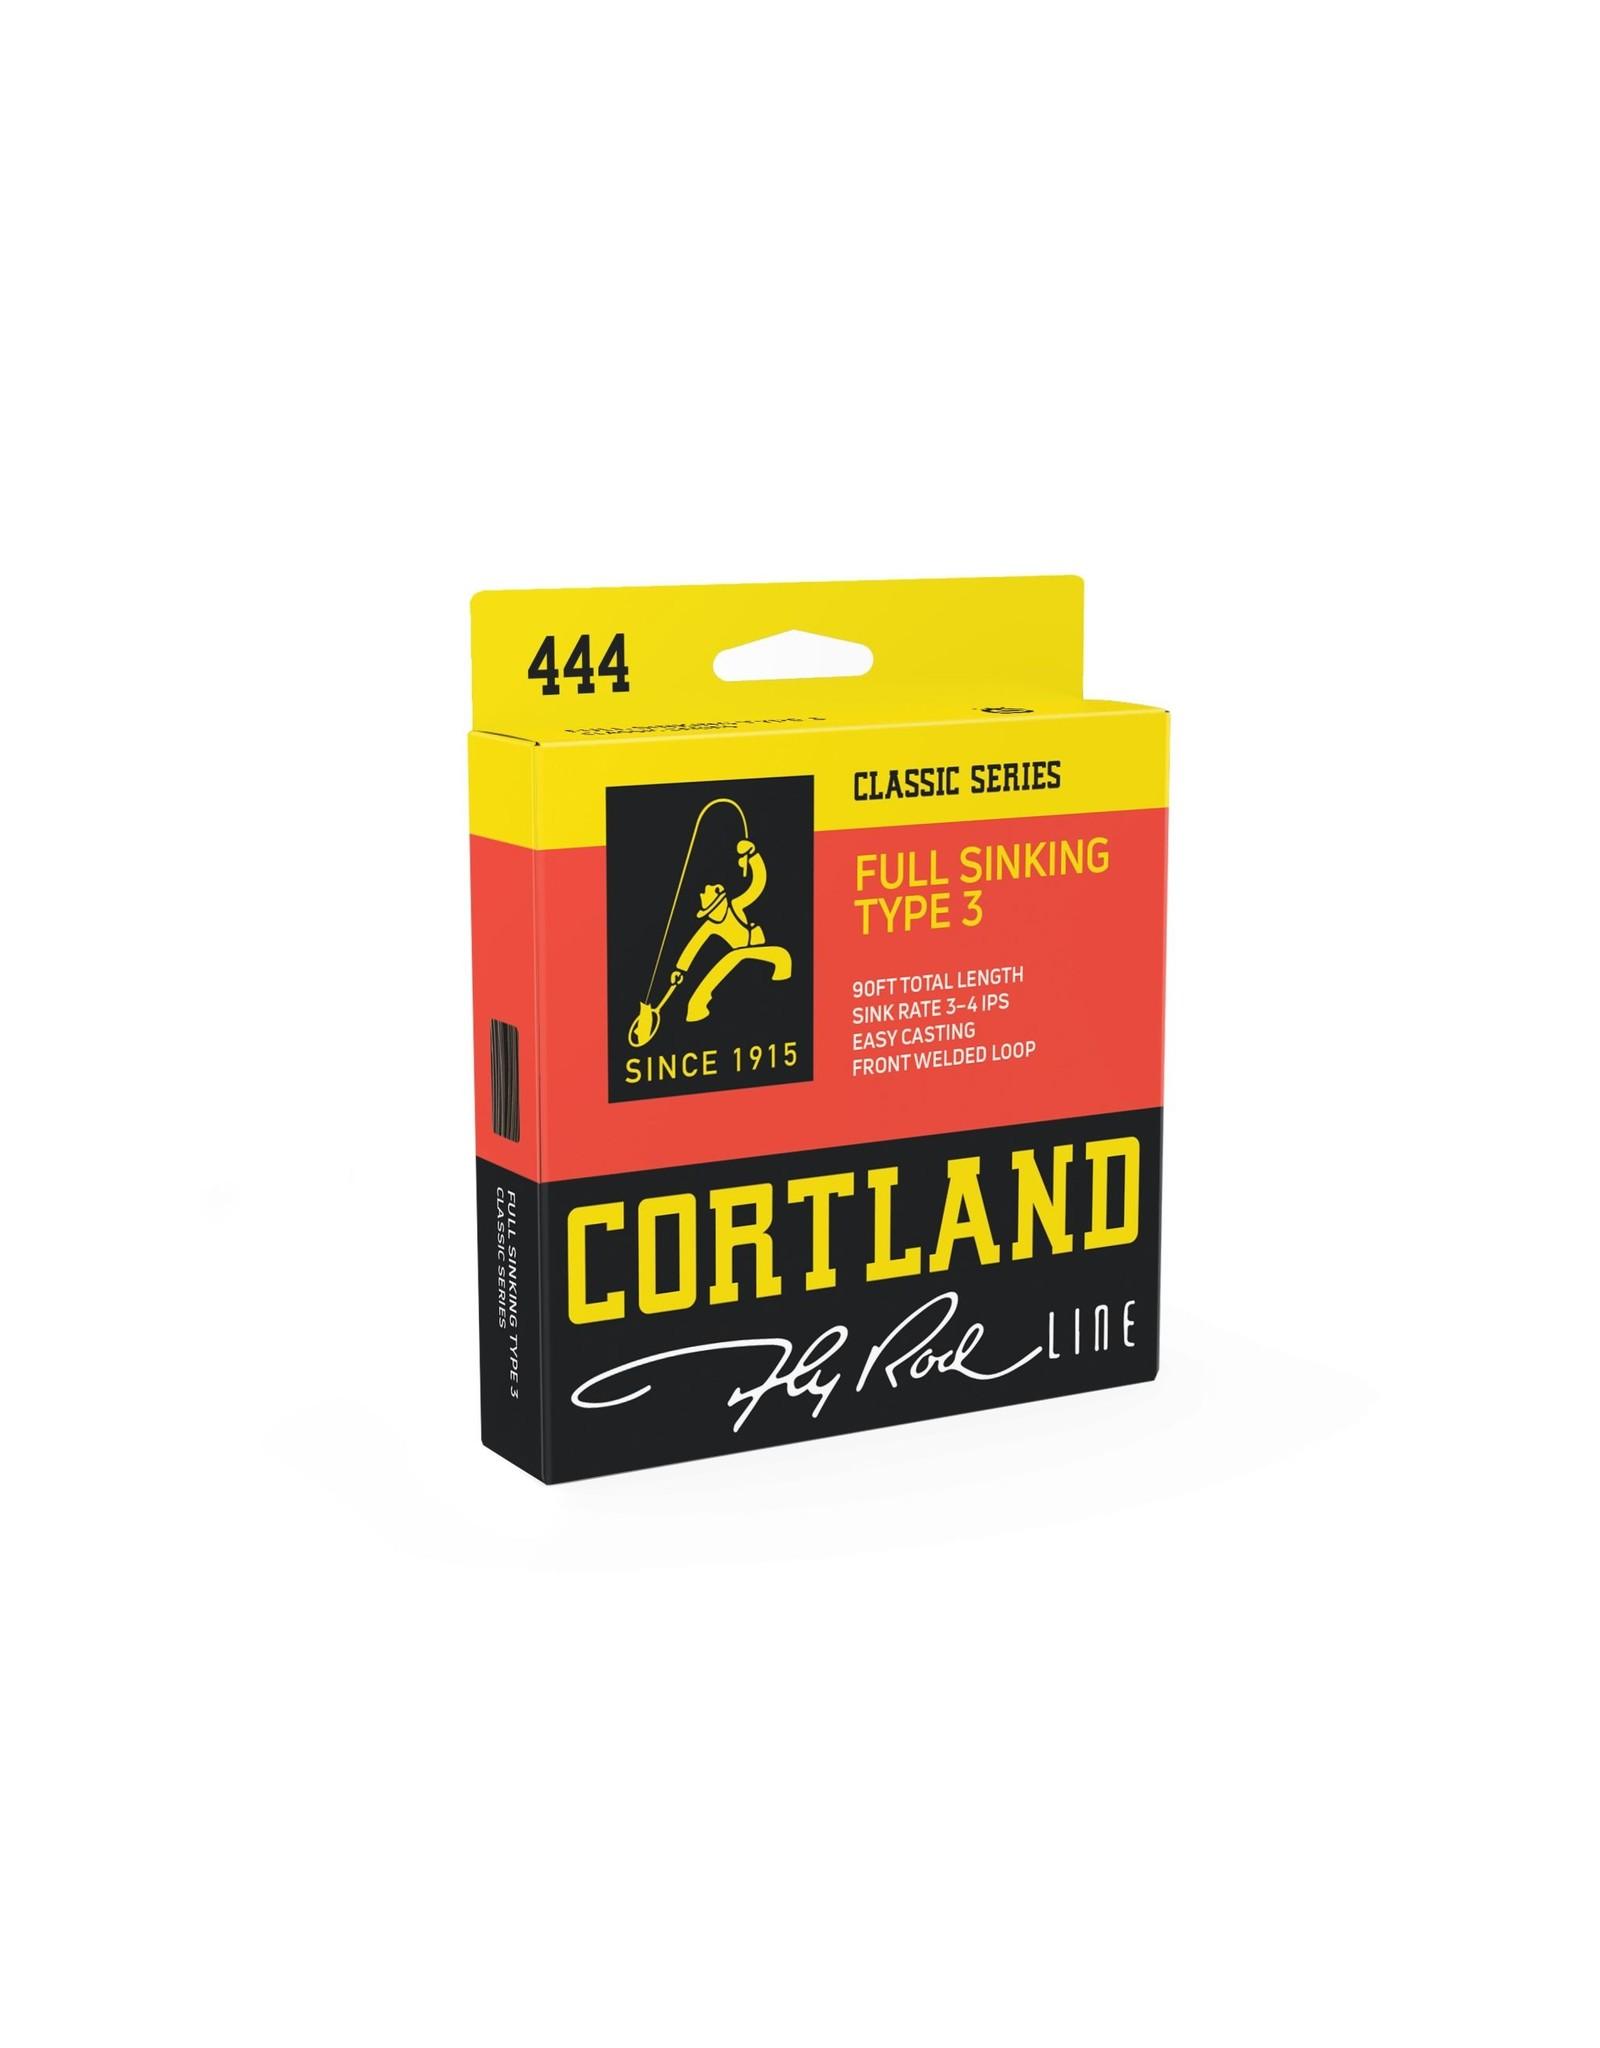 Cortland Line Cortland 444 Classic Full Sinking Type 3 Fly Line